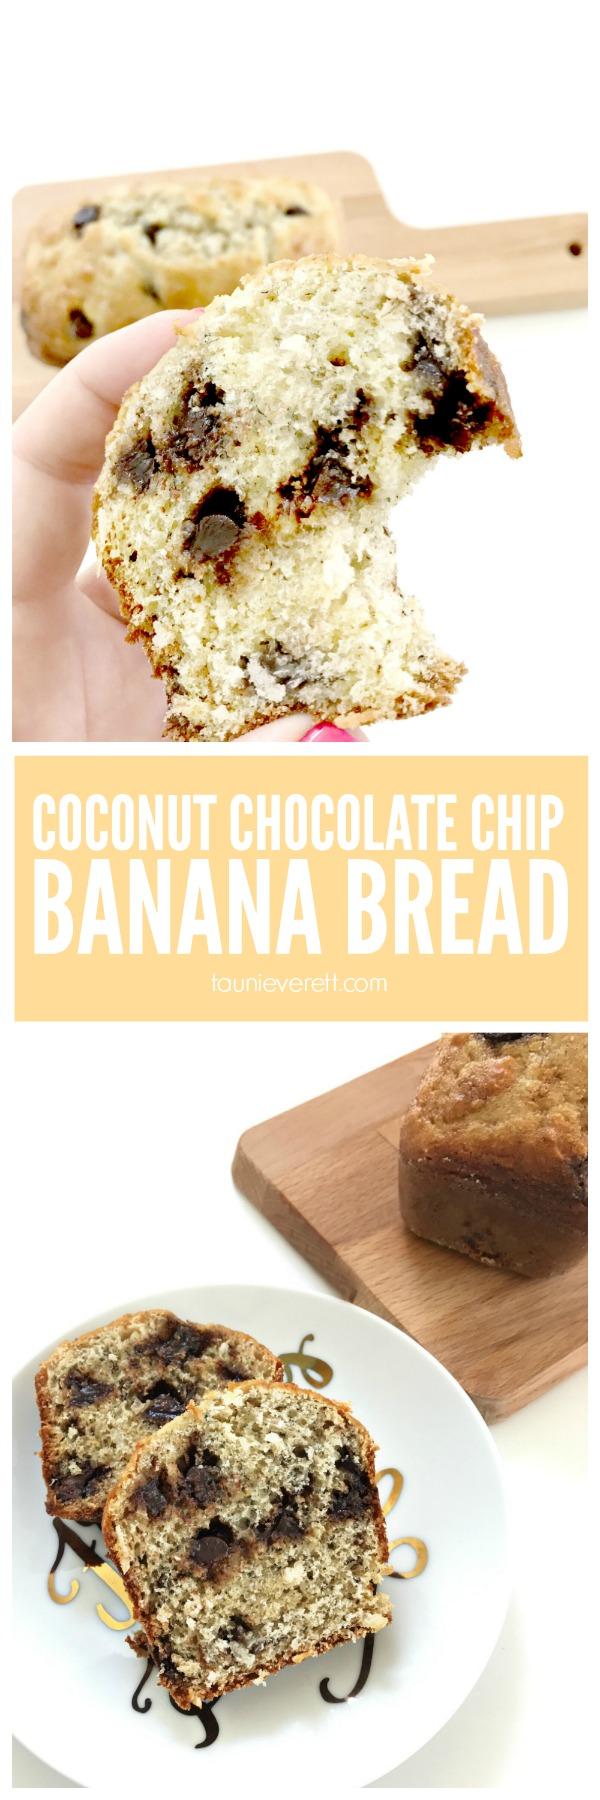 Moist, Sweet Coconut Chocolate Chip Banana Bread.